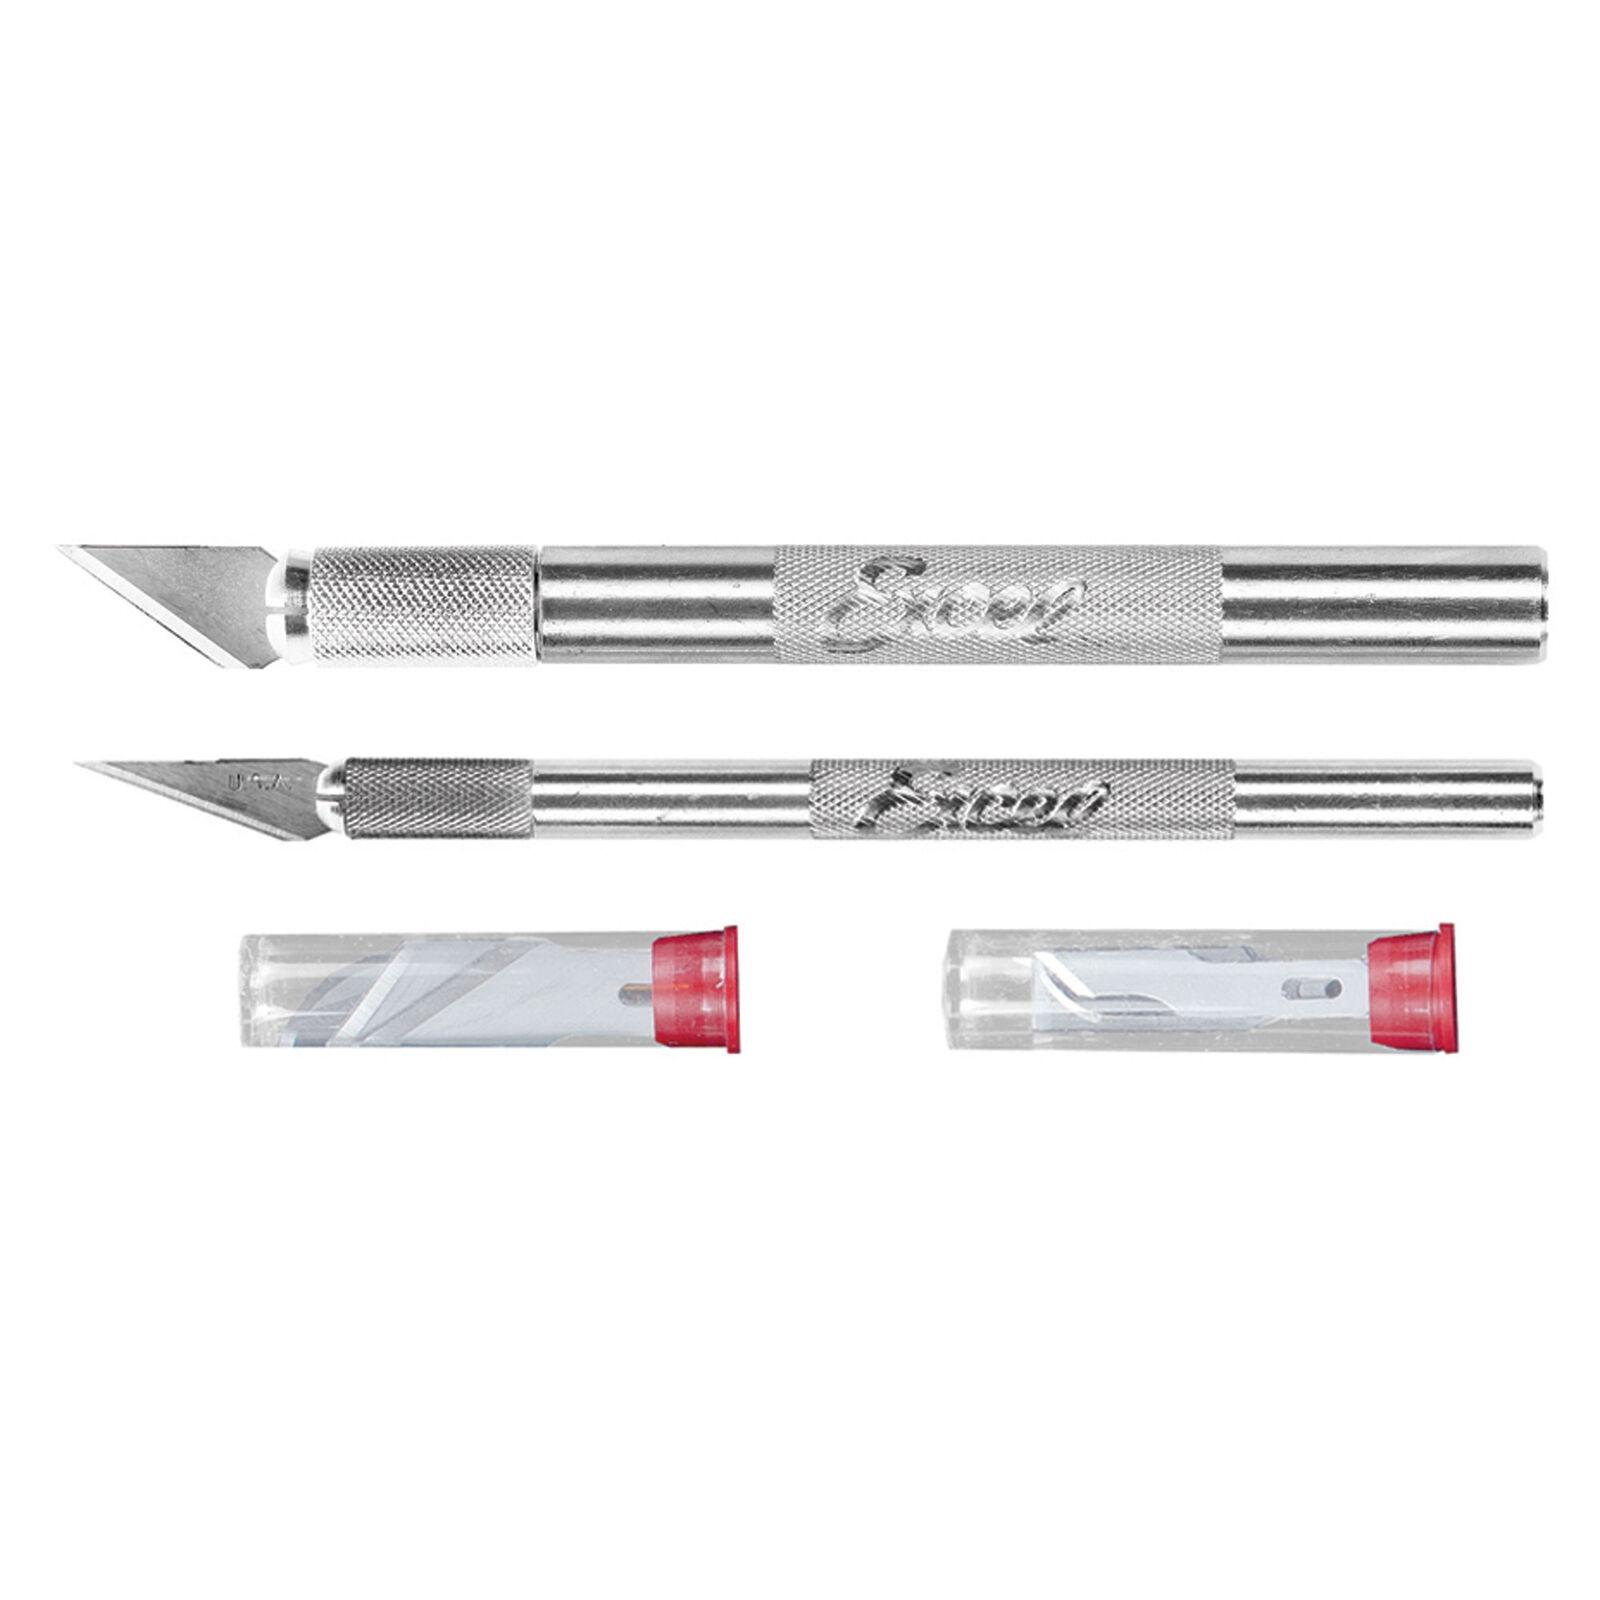 Hobby Knife Set:K1 & K2 with 10 Blades